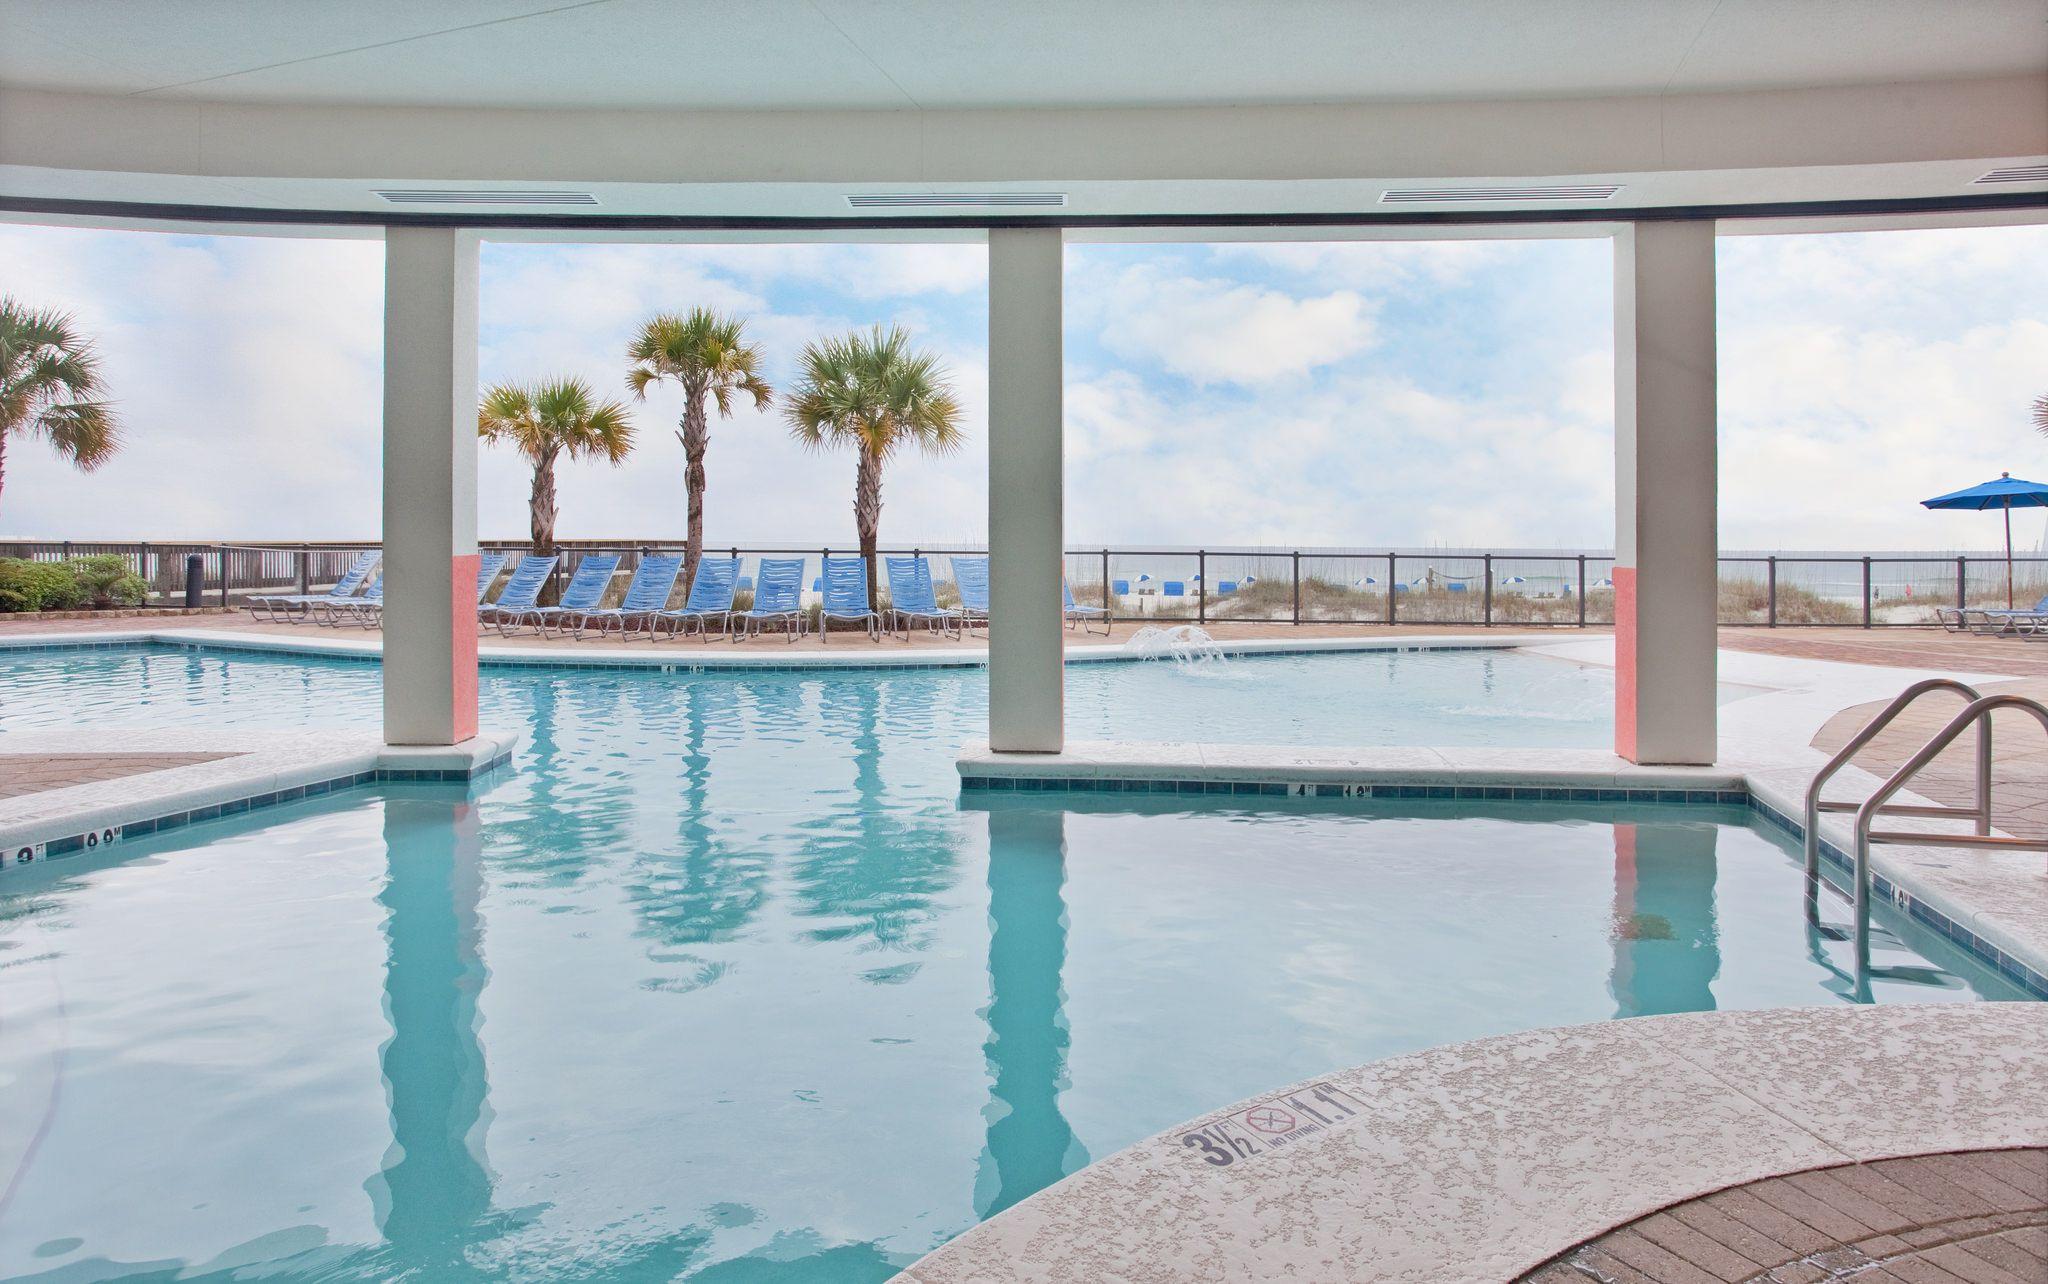 Hampton Inn Suites Beachfront Hotel Orange Beach Gulf Shores Al Beachfront Hotels Gulf Shores Alabama Vacation Orange Beach Hotels